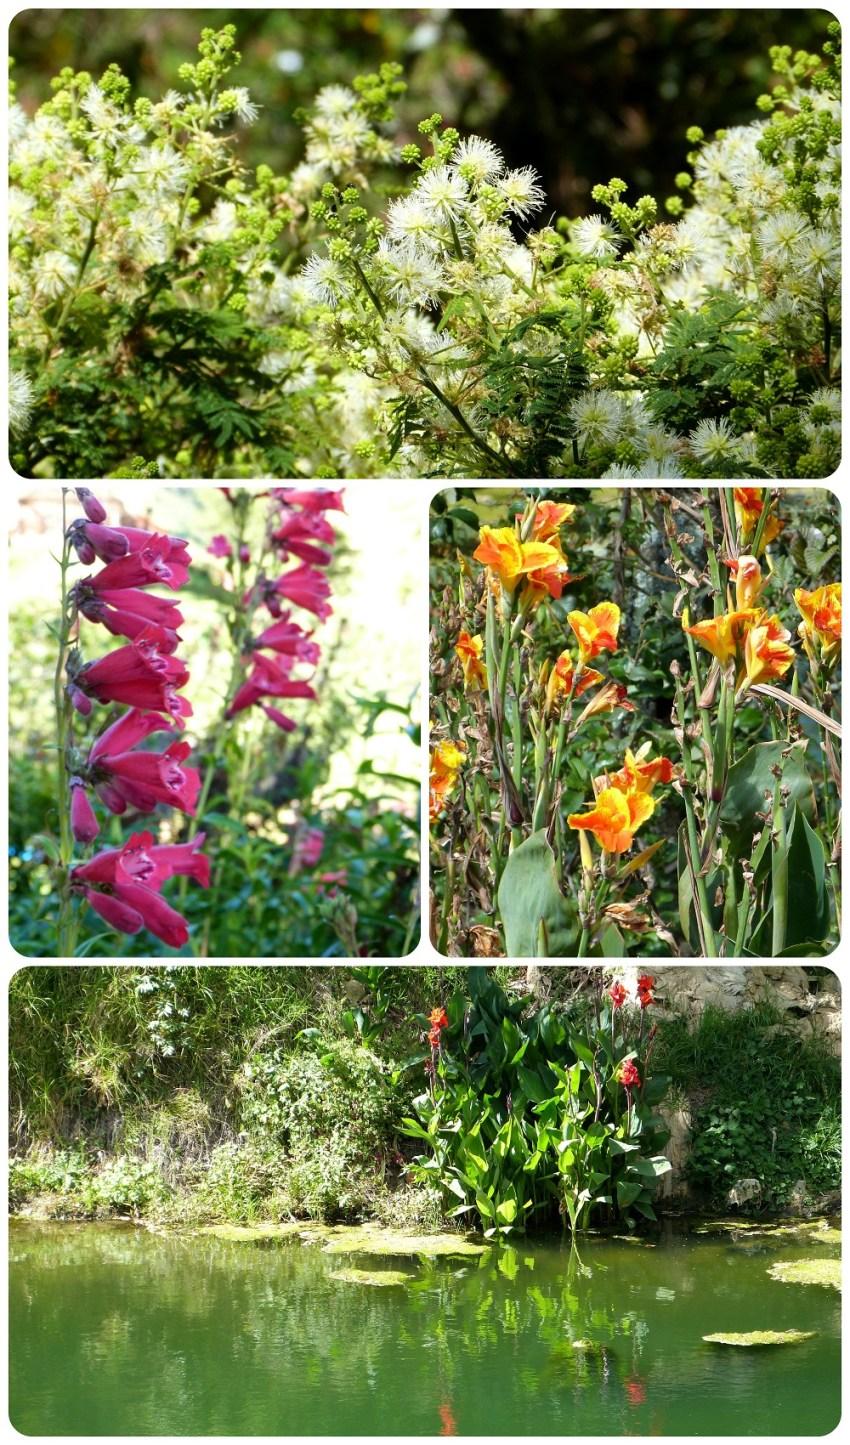 Fleurs et plantes à Aguas Tibias de Coconuco